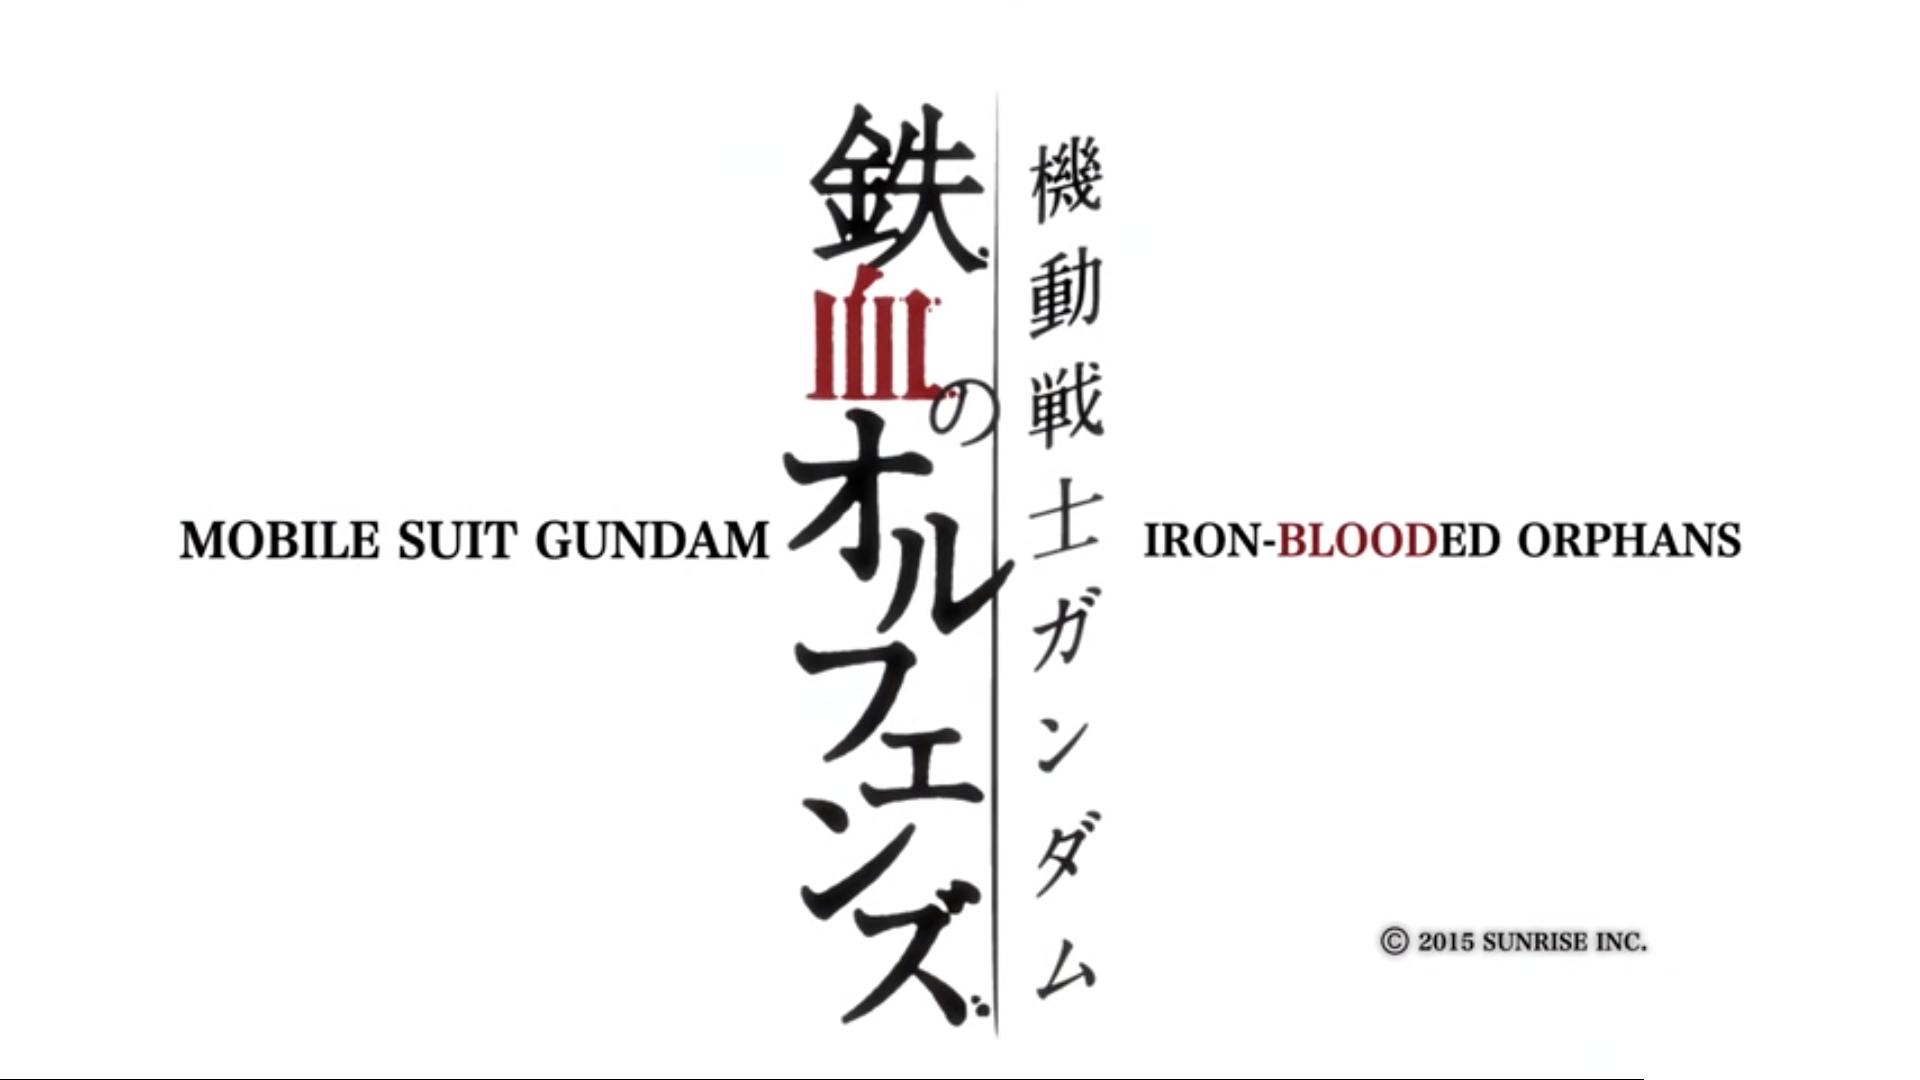 mobile suit gundam iron-blooded orphans episode 14